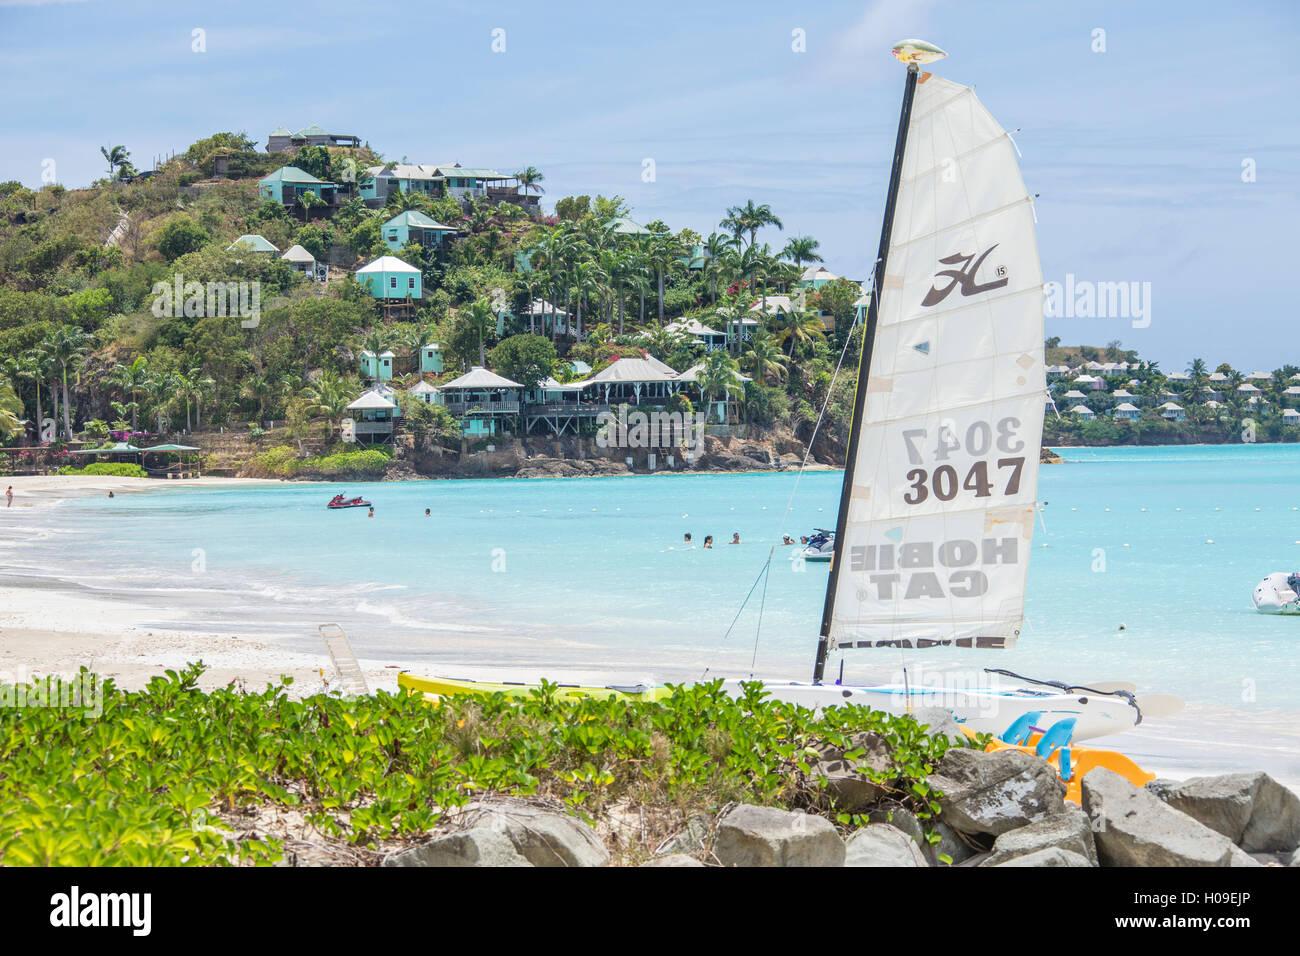 The resort on the Caribbean Sea and boats for tourists, Jolly Beach, Antigua, Antigua and Barbuda, Leeward Islands, - Stock Image